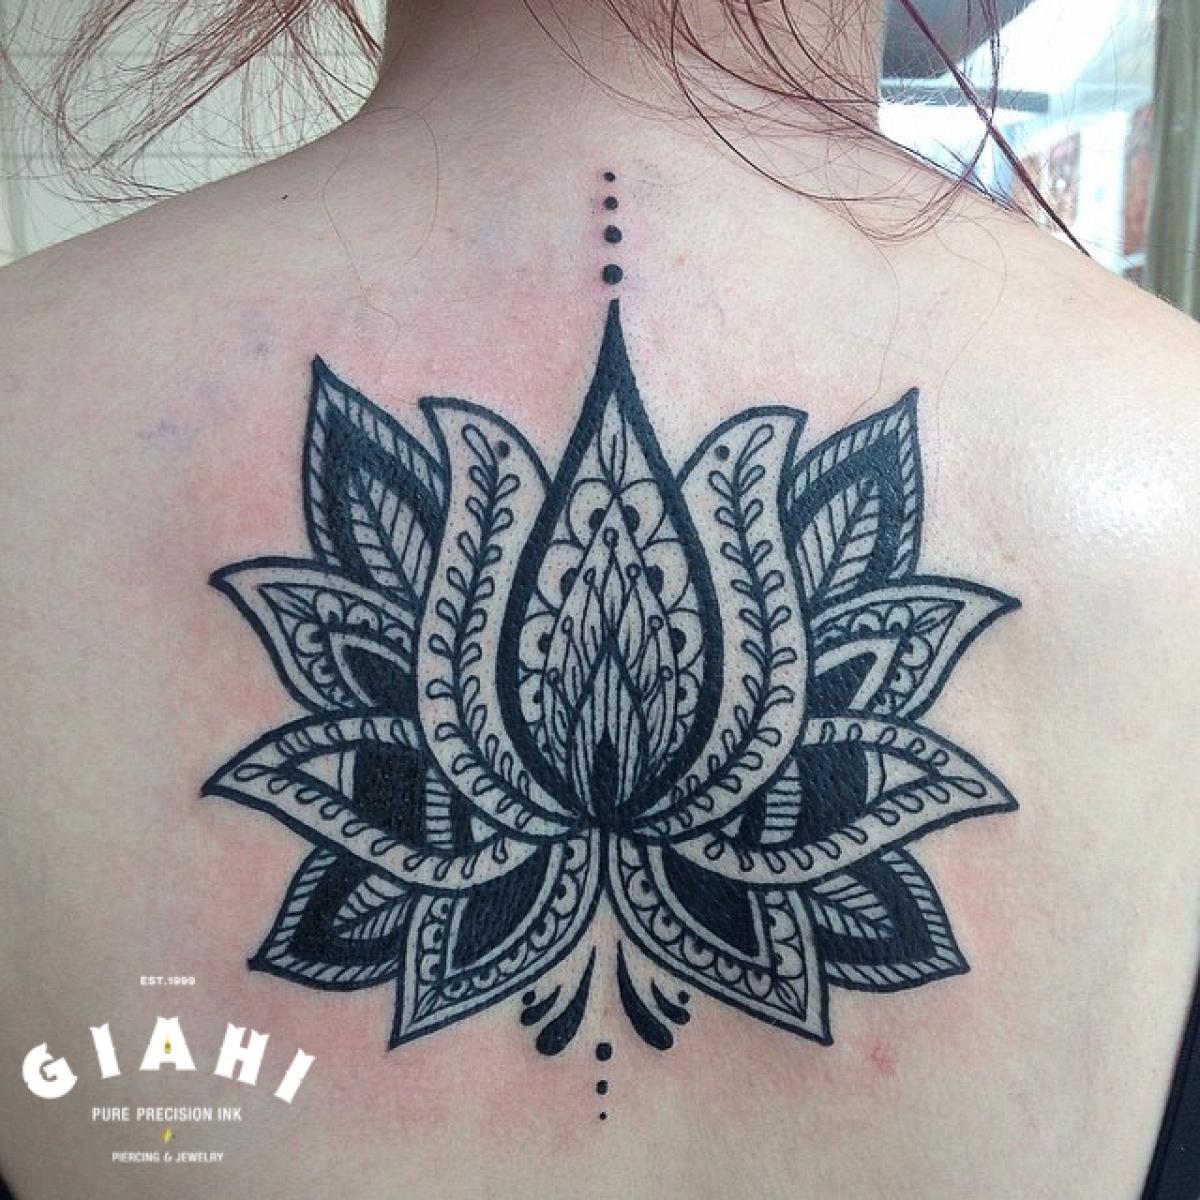 Back Blackwork Mehendir Flower tattoo by Elda Bernardes